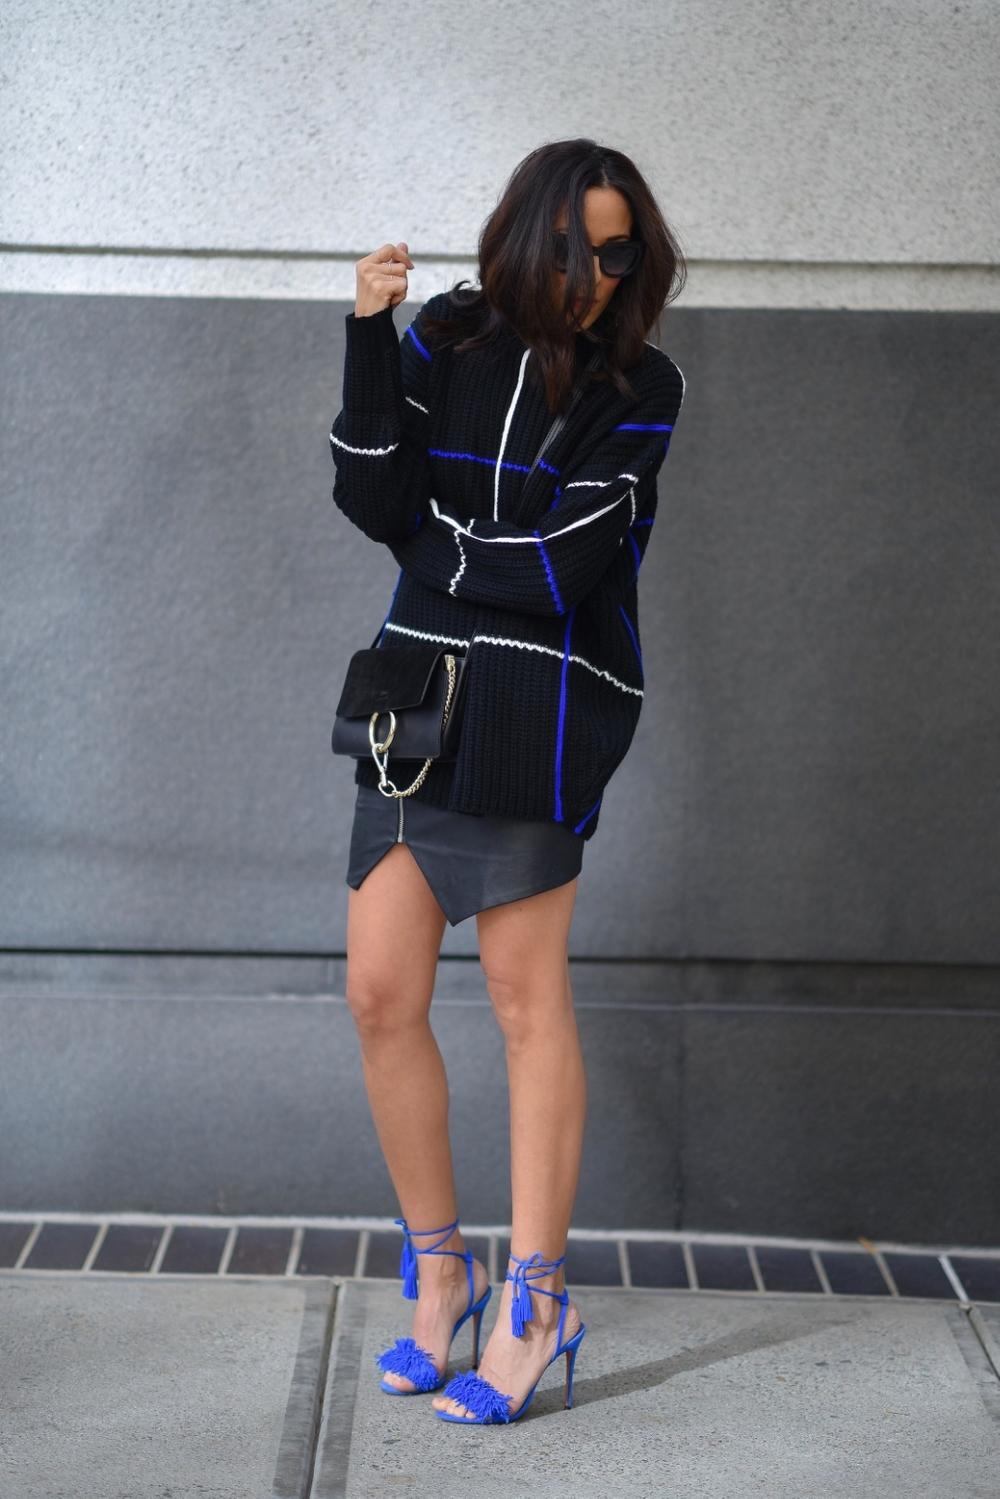 Aquazzurra_LeatherSkirt_AzzurraCapriBoutiqueLucyswhims_Streetstyle_FashionBlogger.jpg